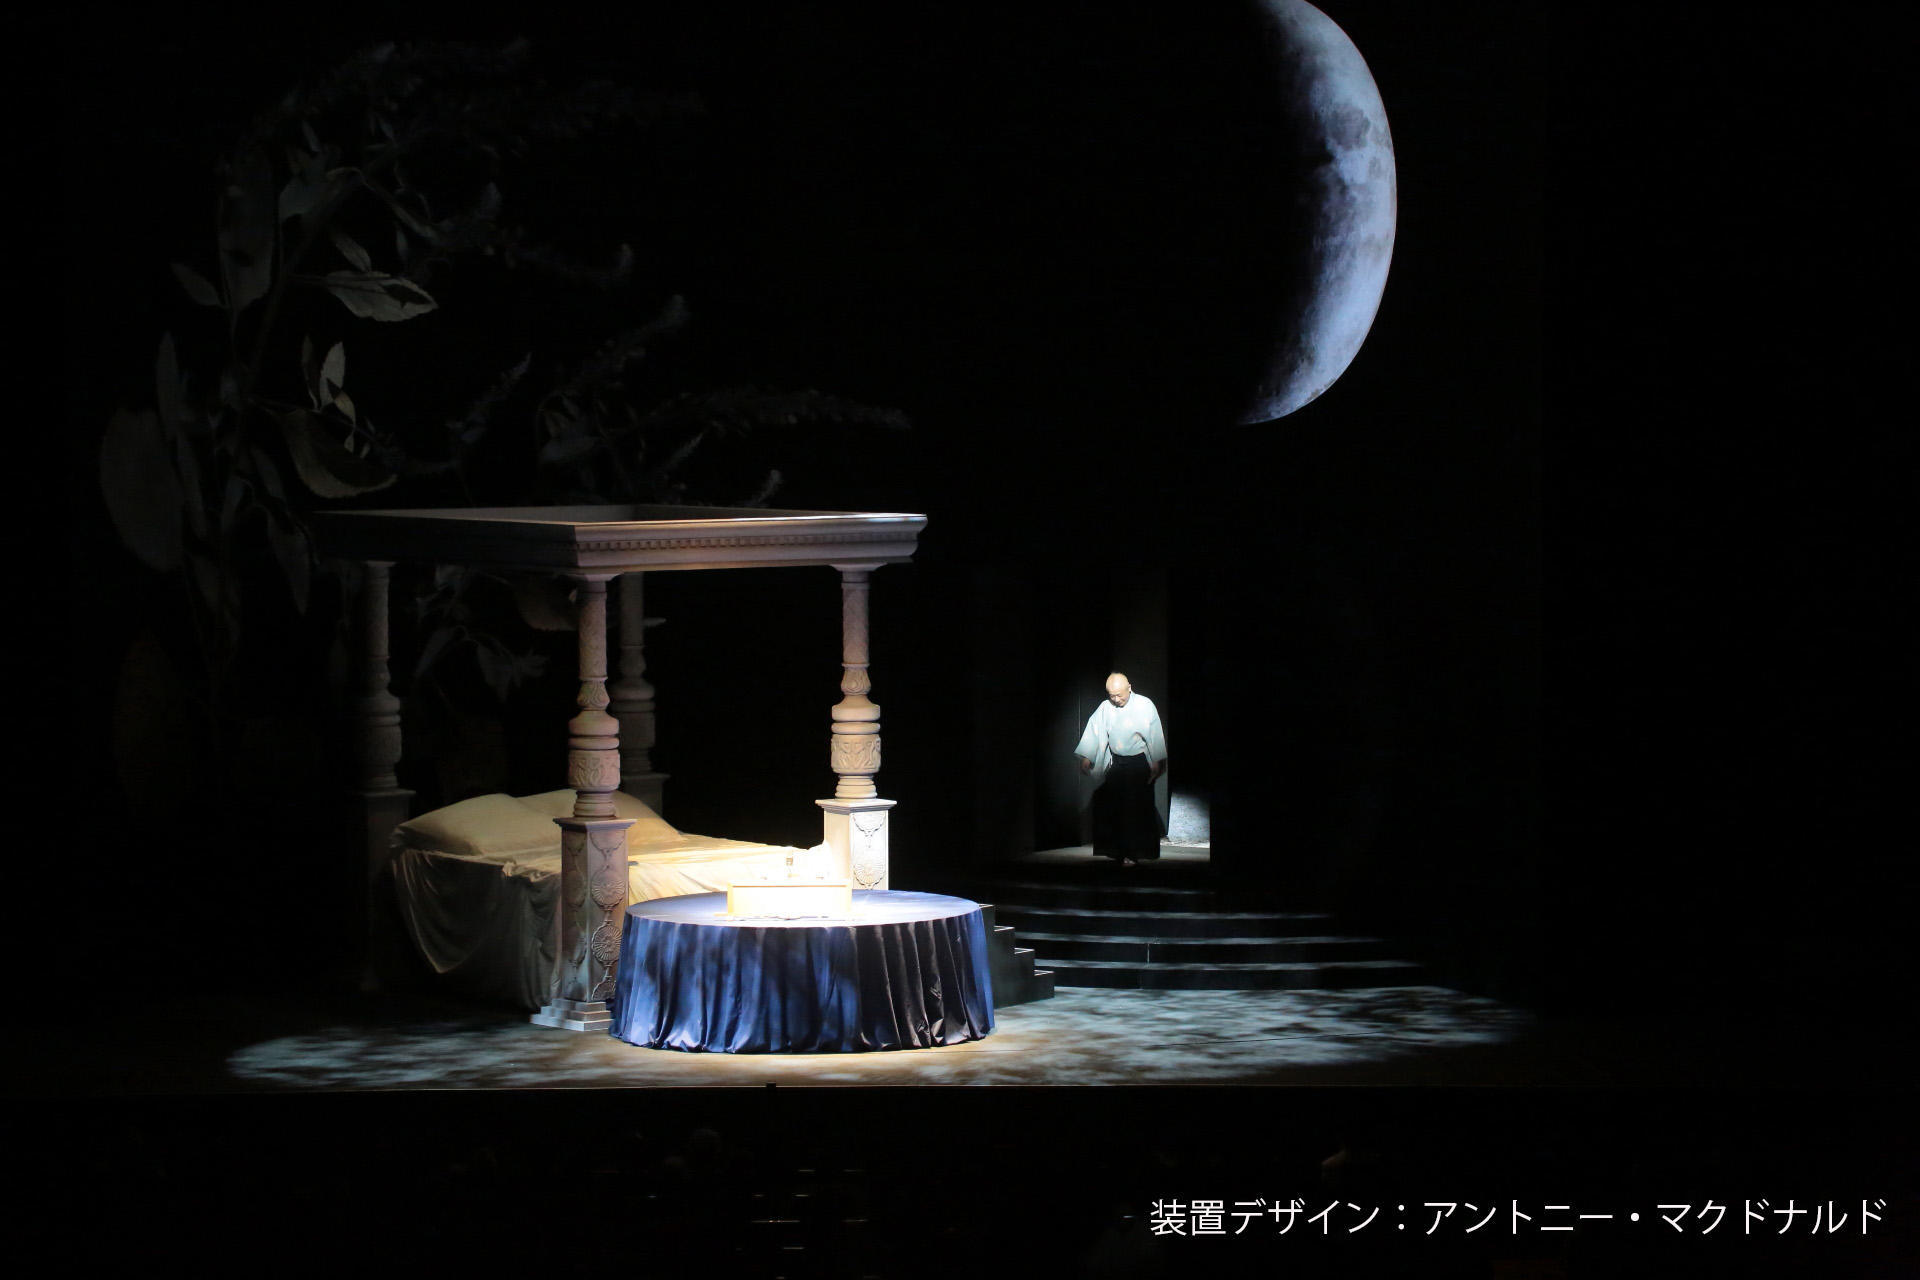 http://news.yoshimoto.co.jp/20160731003914-0d4dedc3094d36ba0dfd568433c470aa19a4c8c7.jpg